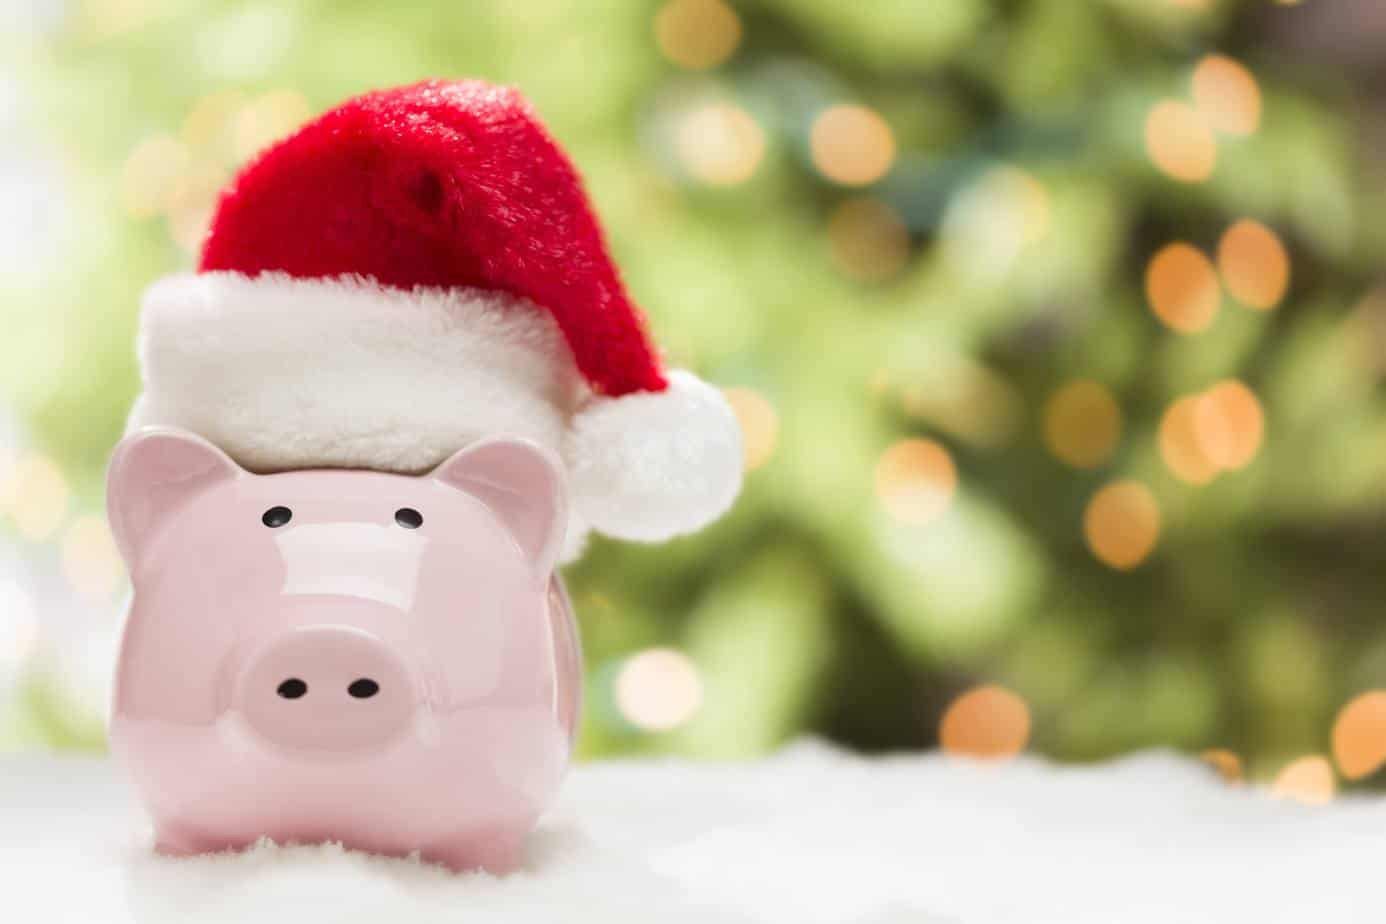 piggy bank with Santa hat on